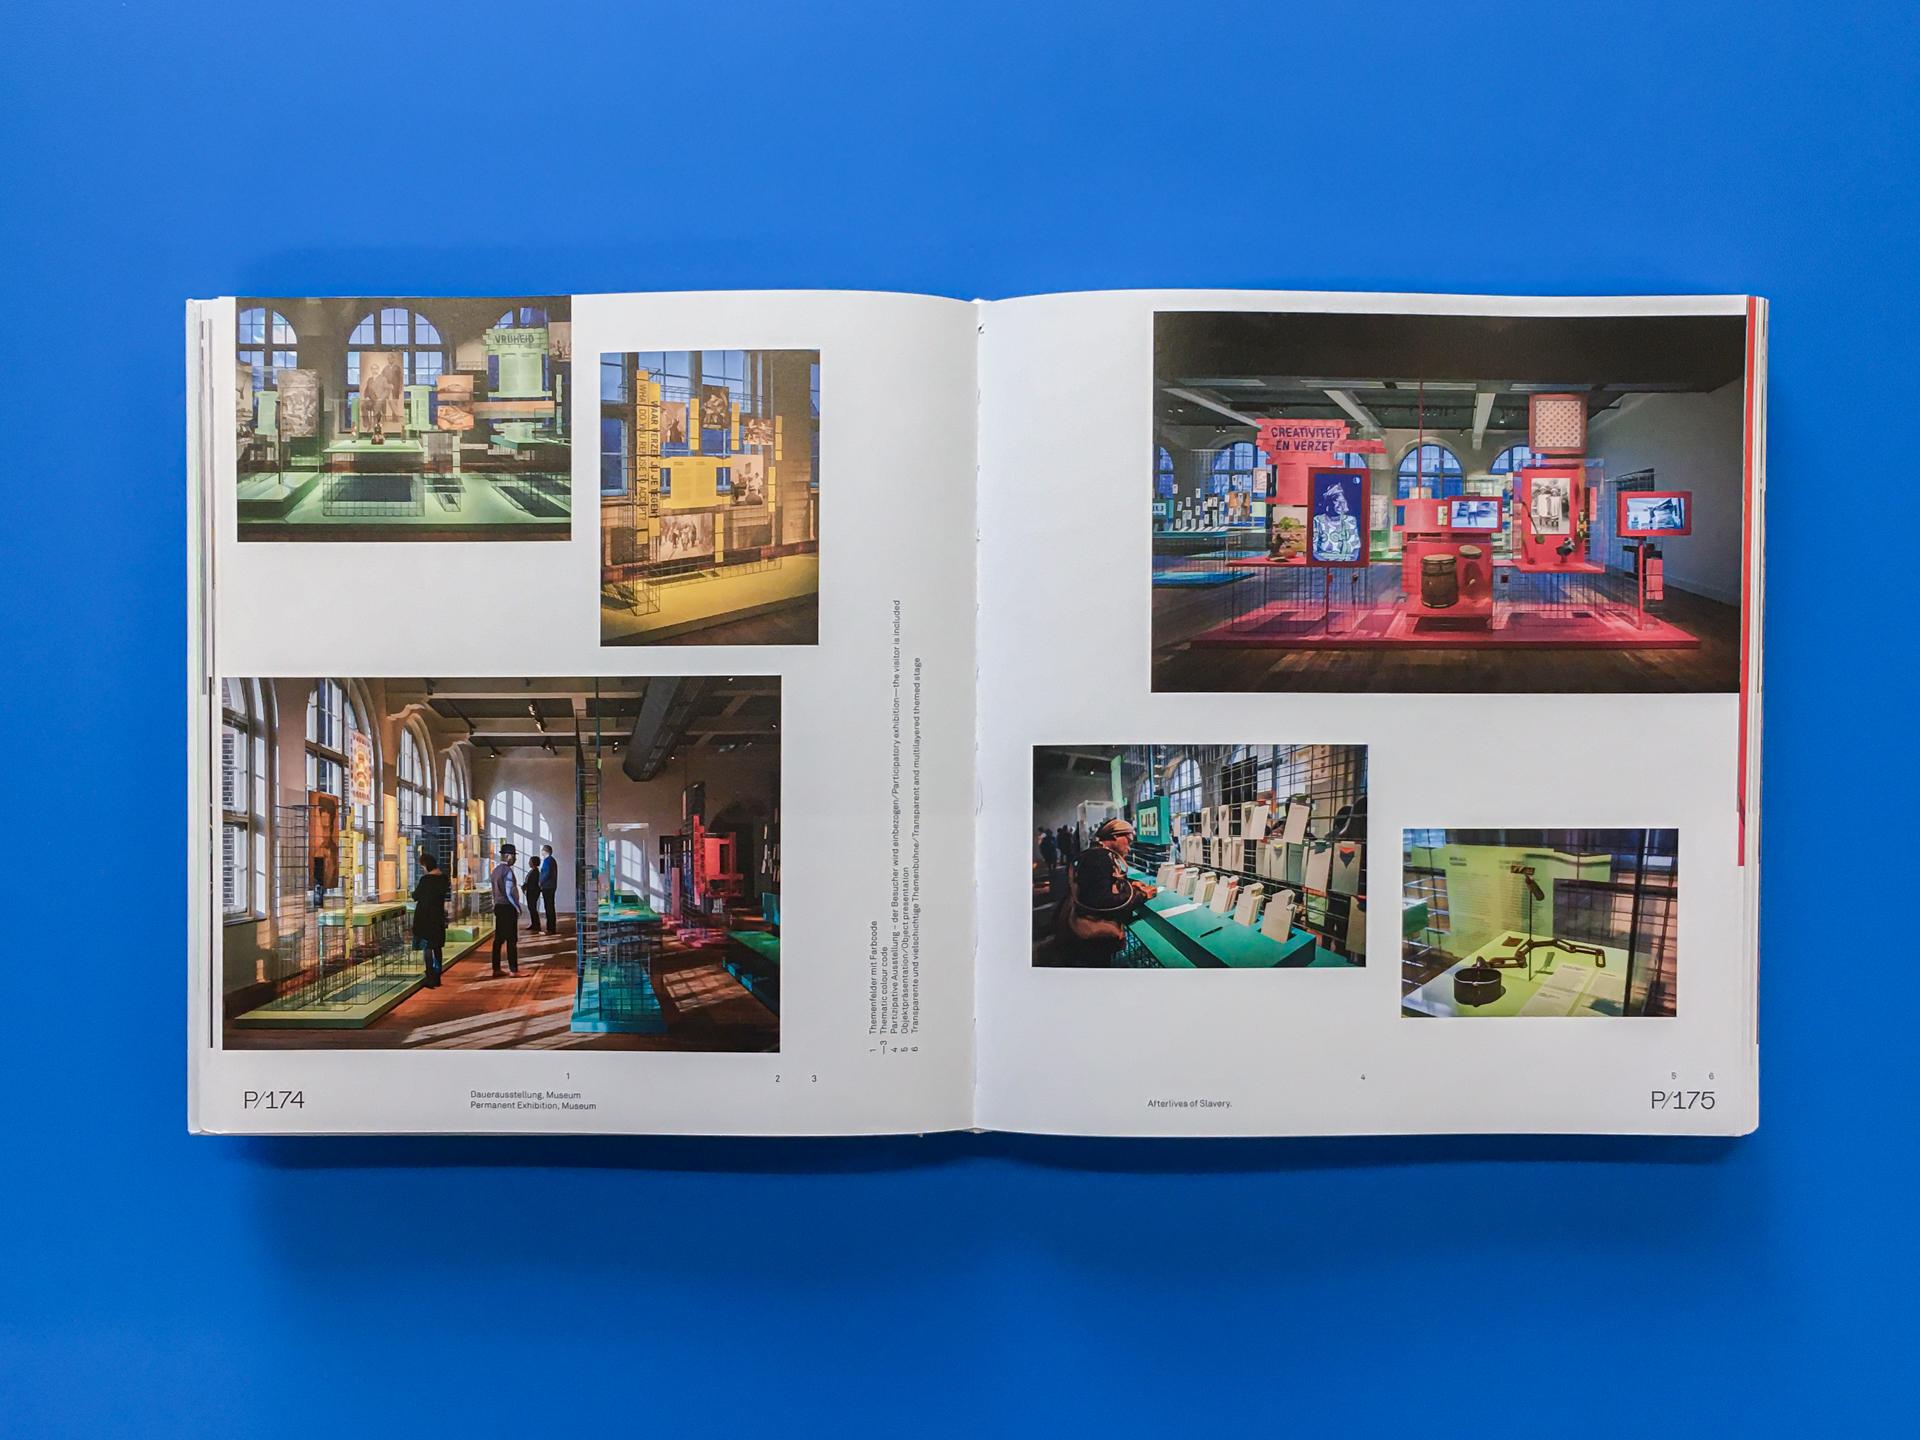 dvvd tm new exhibition design 03 book 3 1 jpg